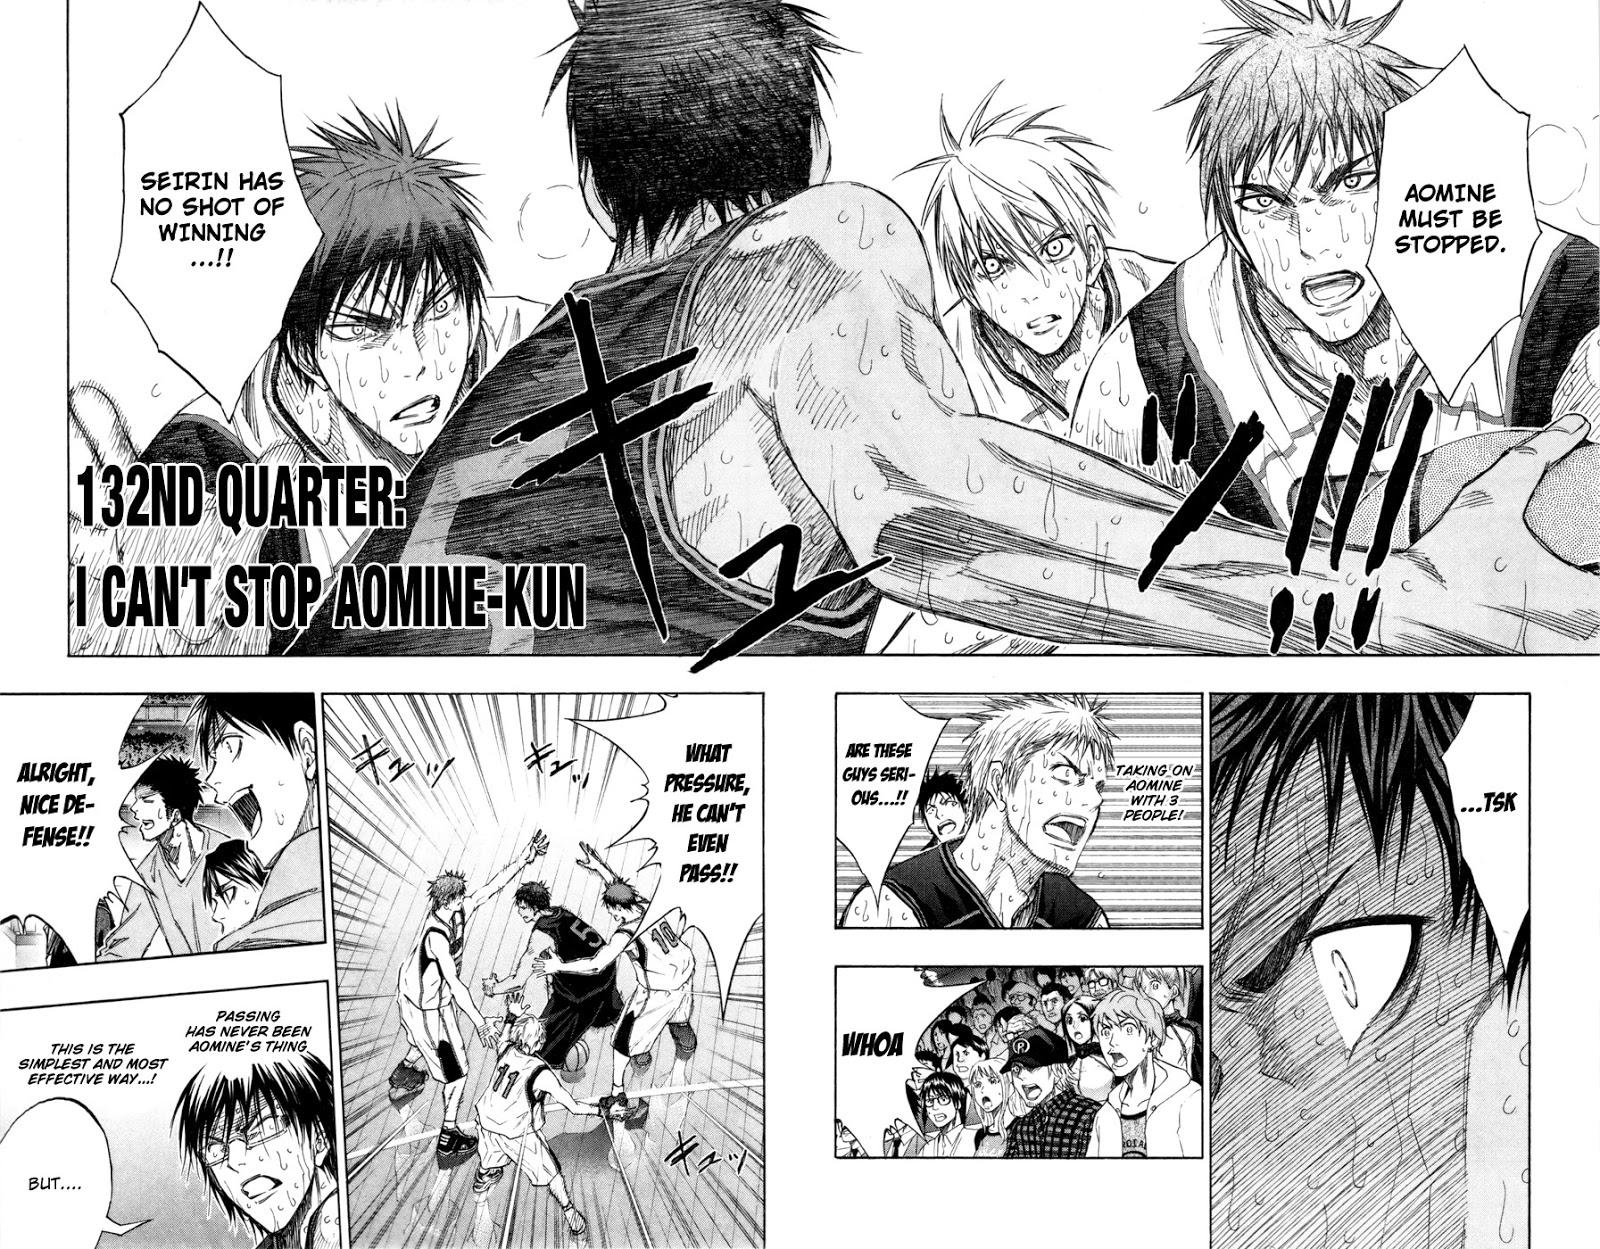 Kuroko no Basket Manga Chapter 132 - Image 02-02